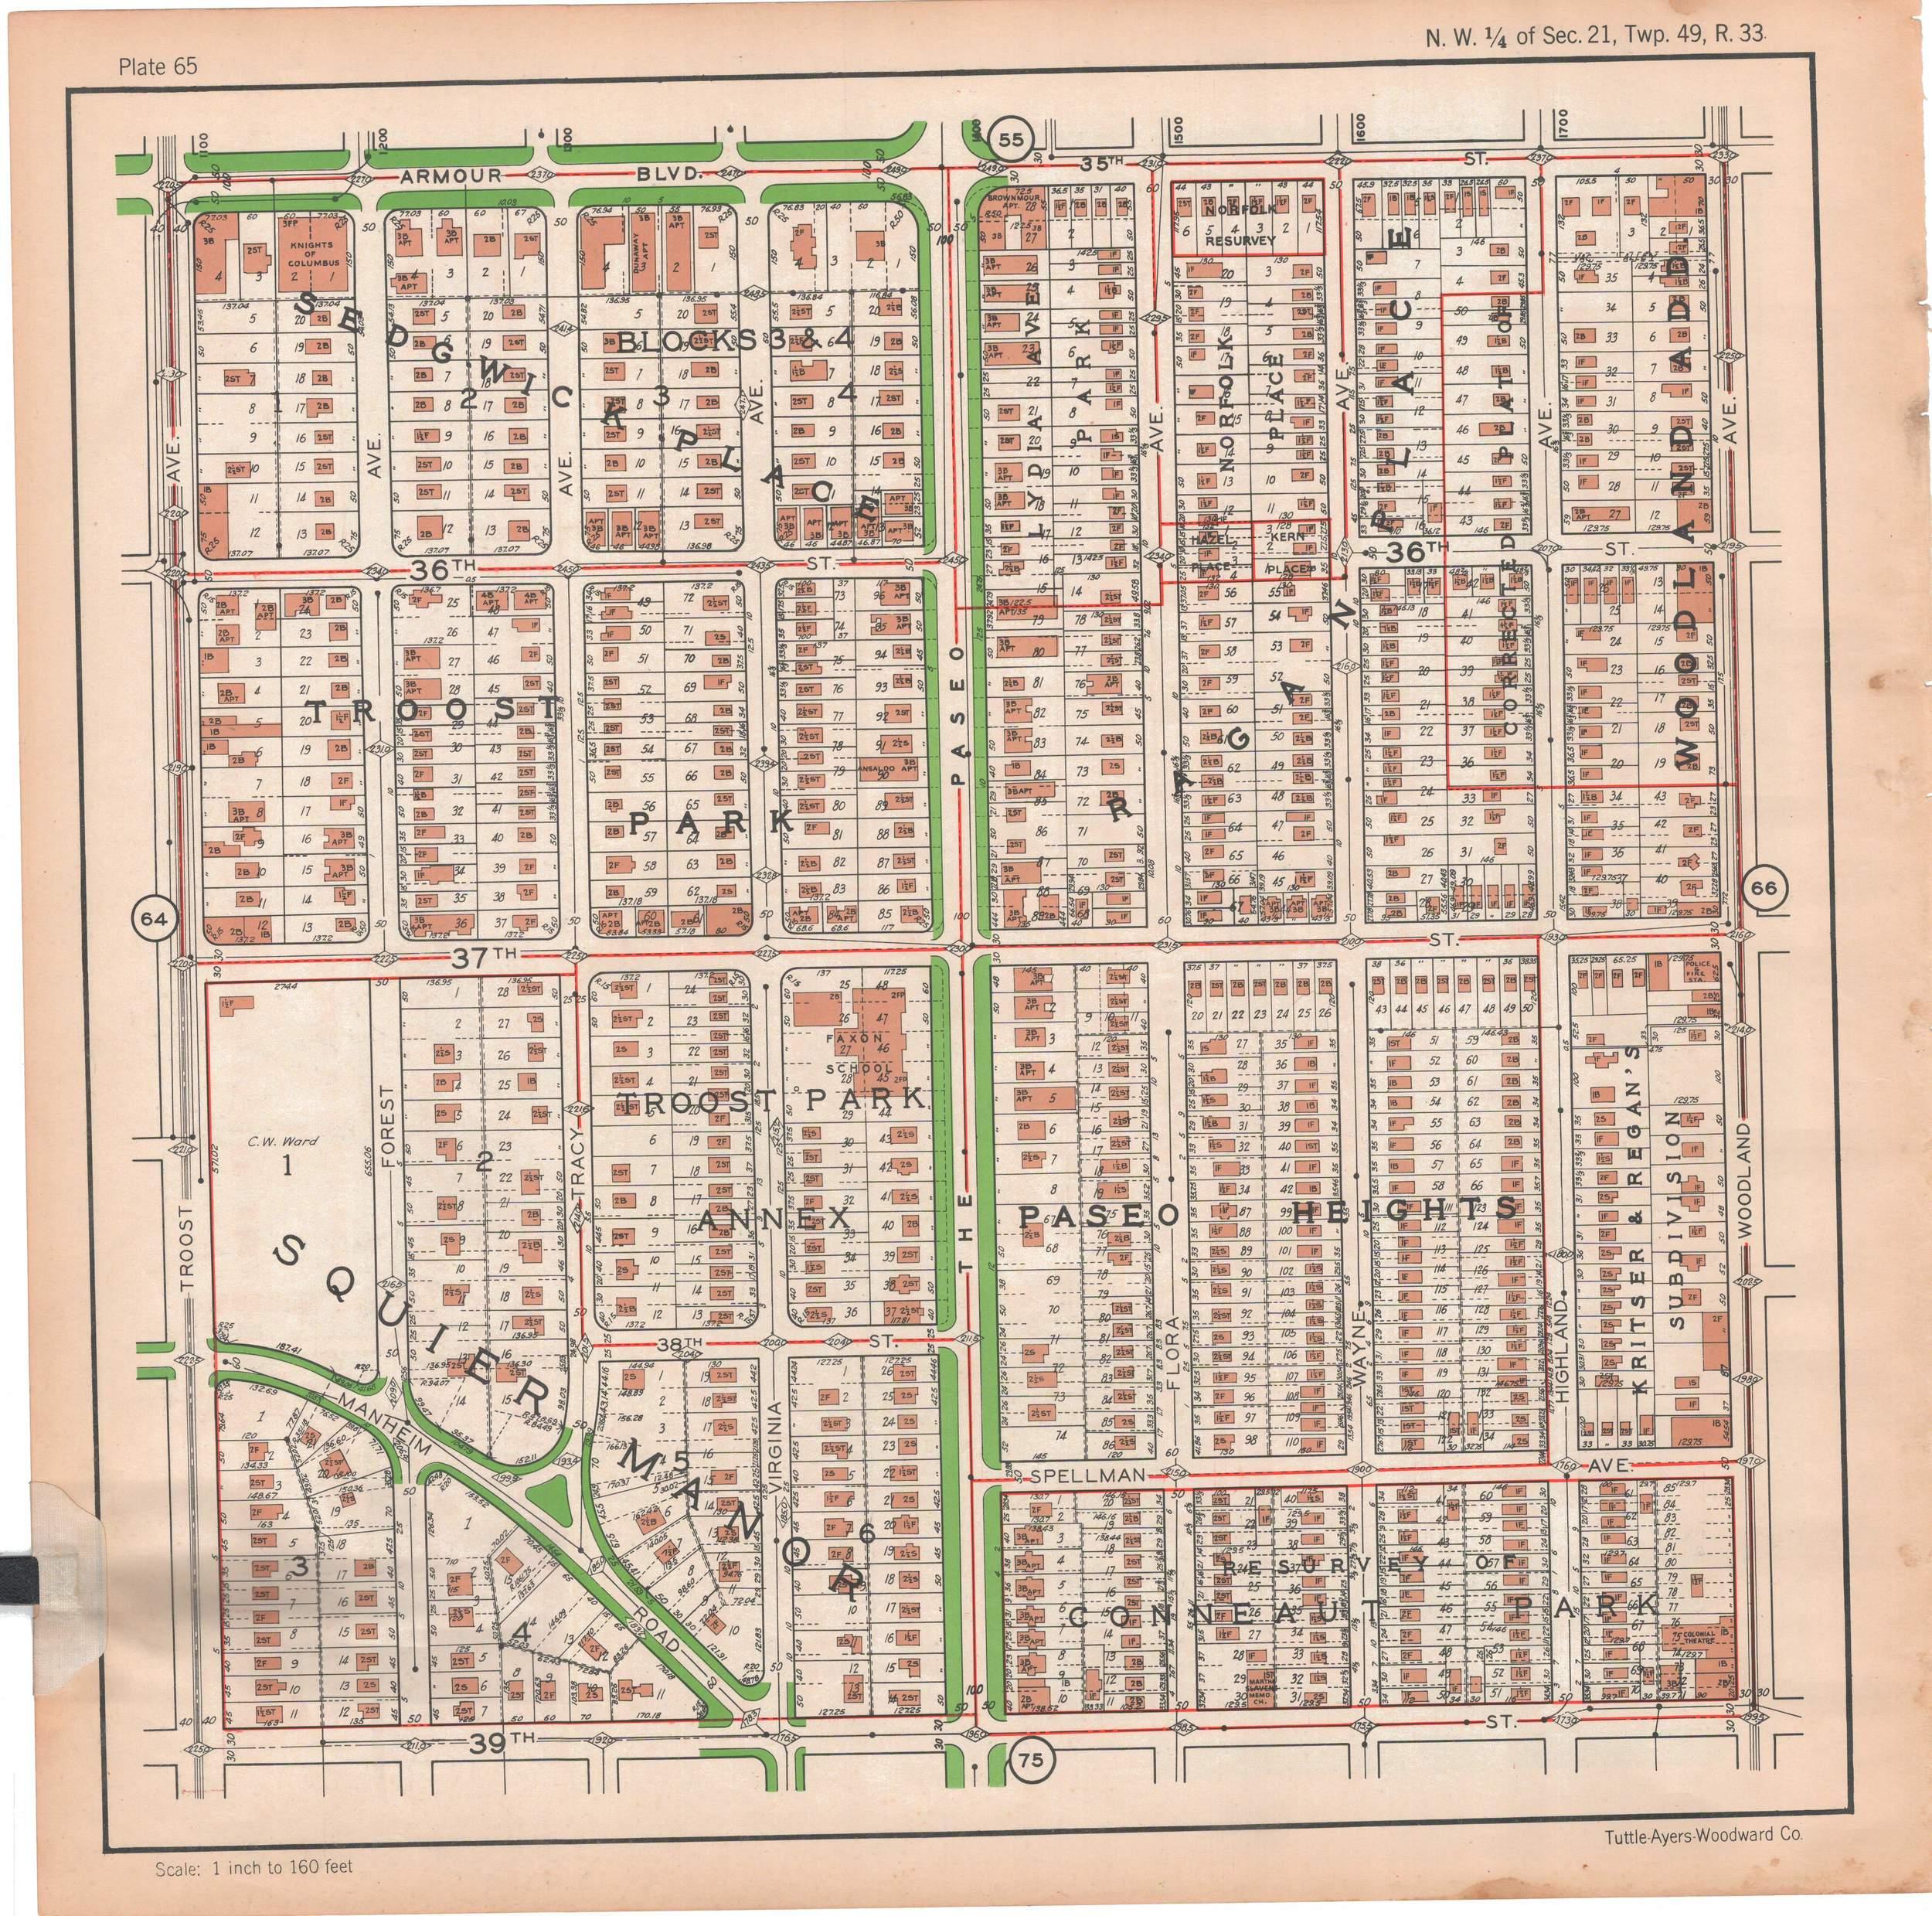 1925 TUTTLE_AYERS_Plate 65.JPG